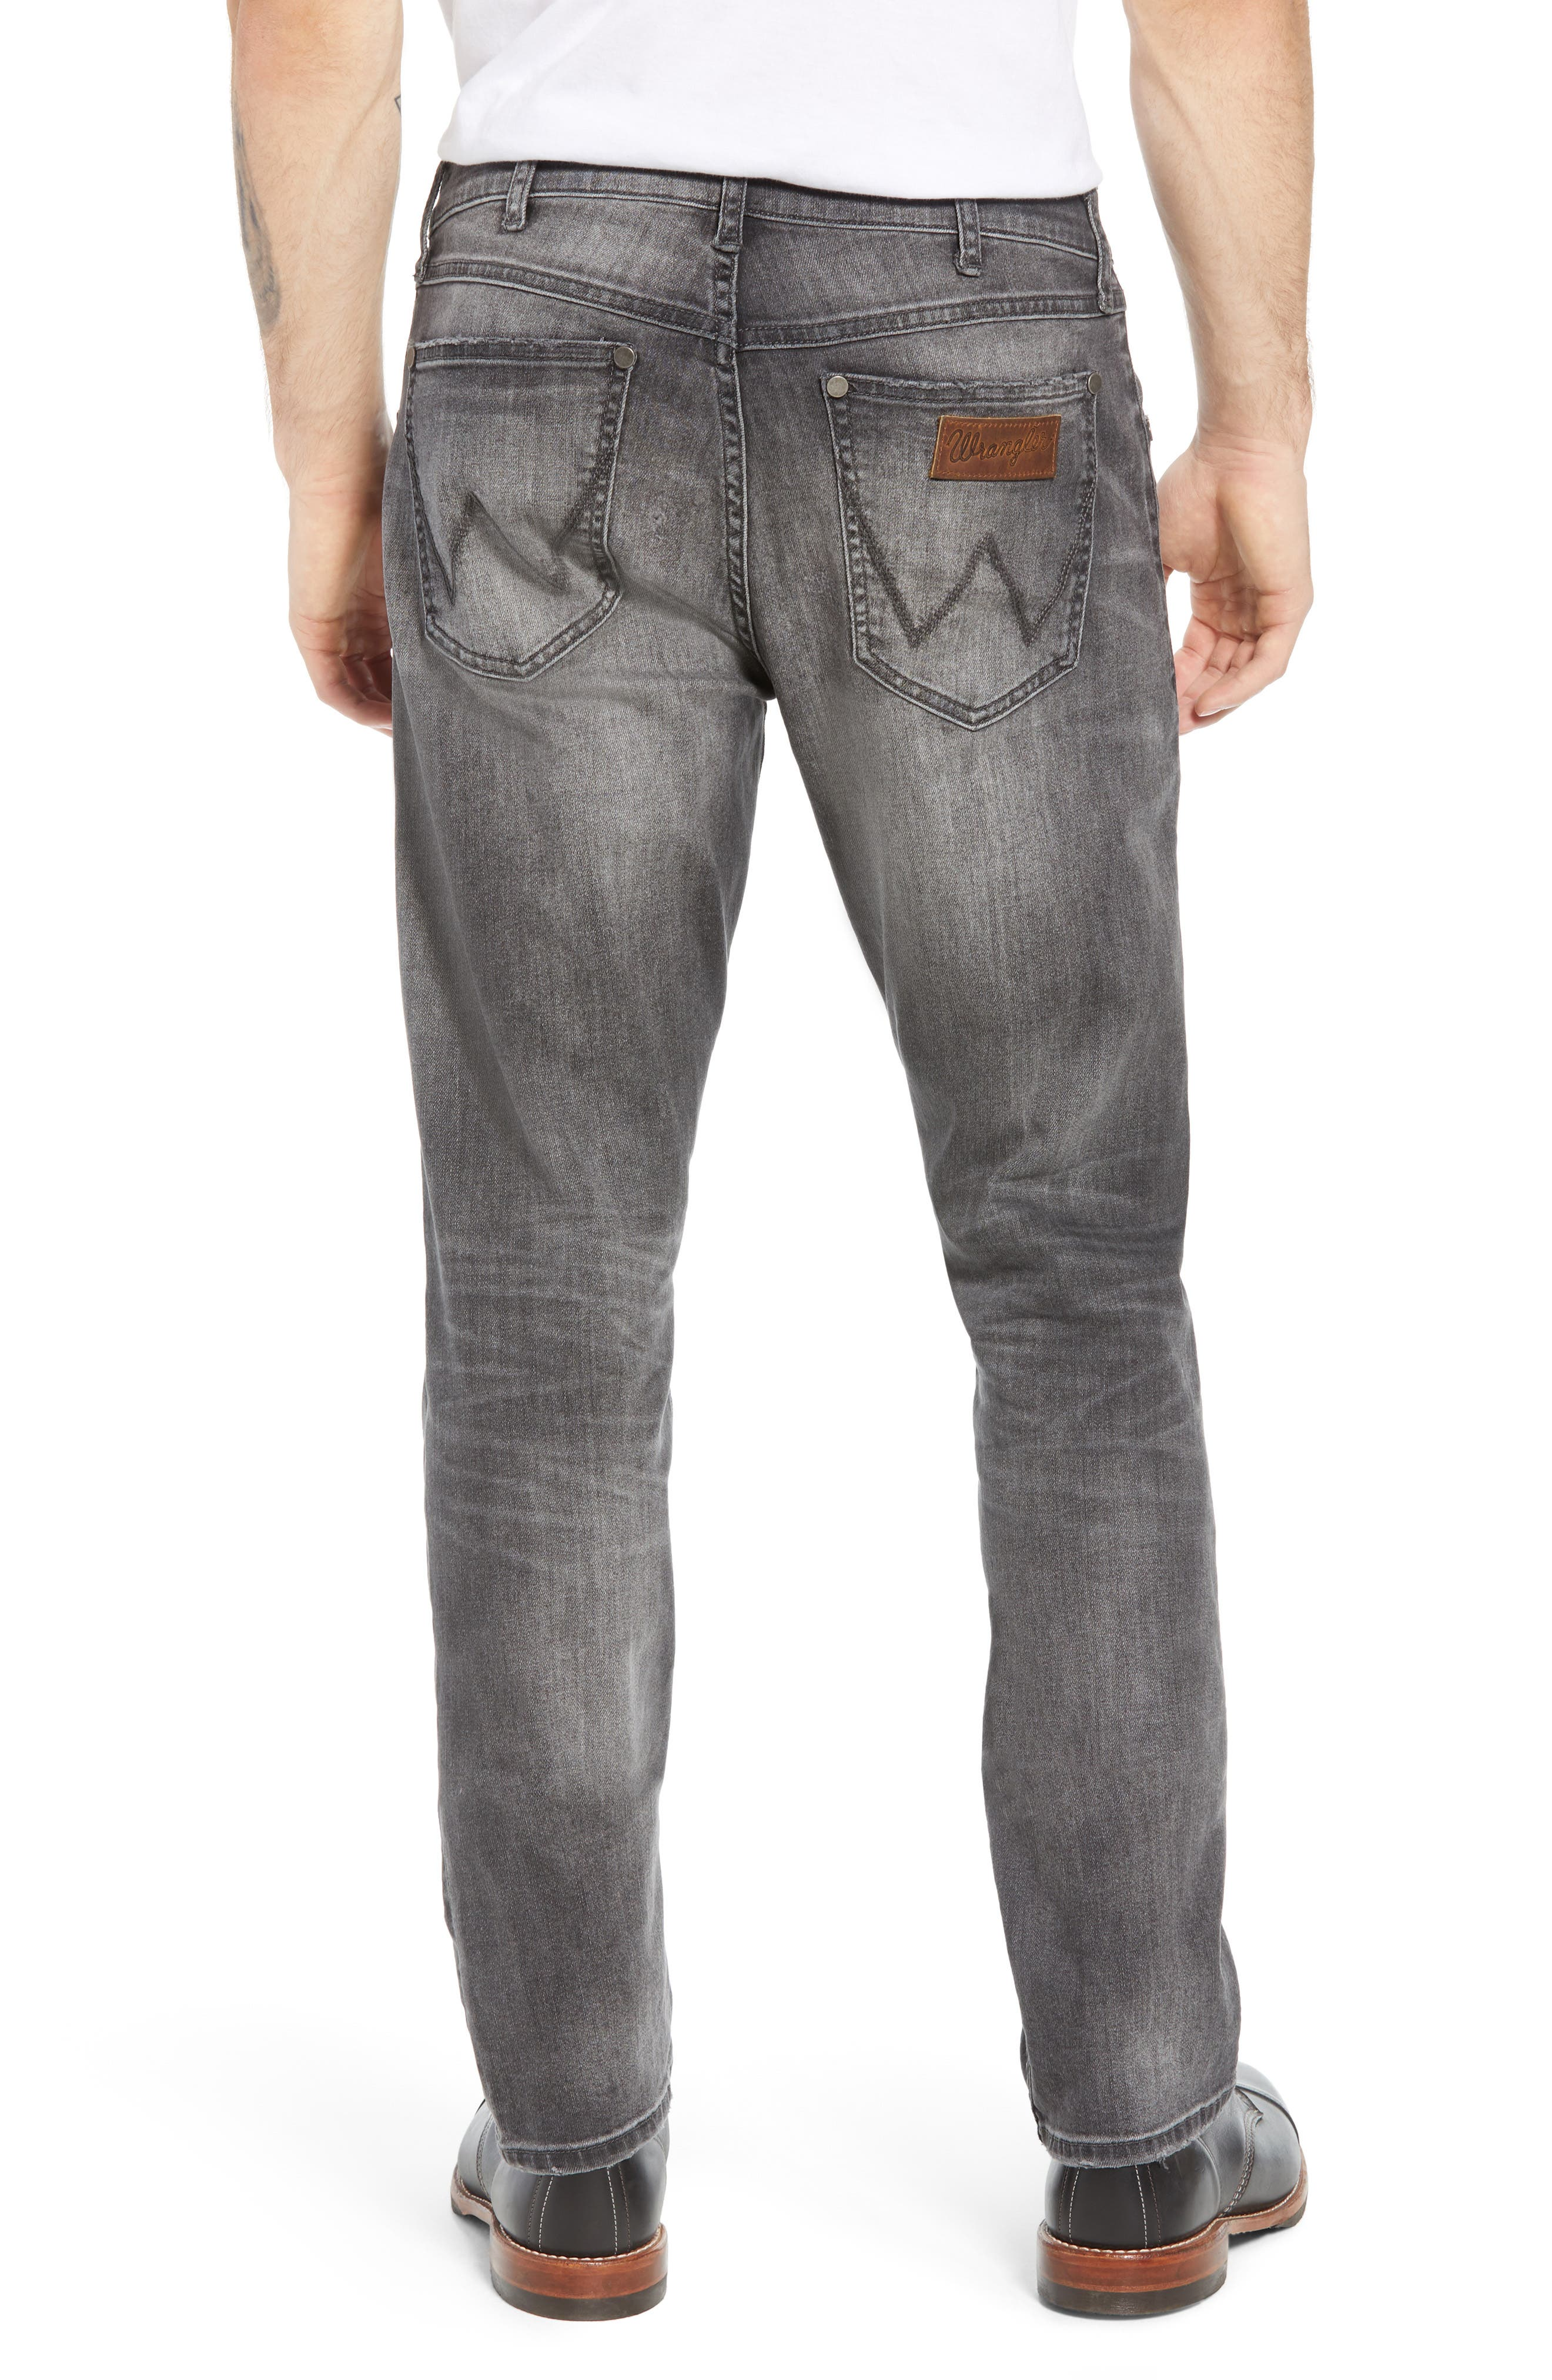 Greensboro Straight Leg Jeans,                             Alternate thumbnail 2, color,                             GREY DESTRUCT